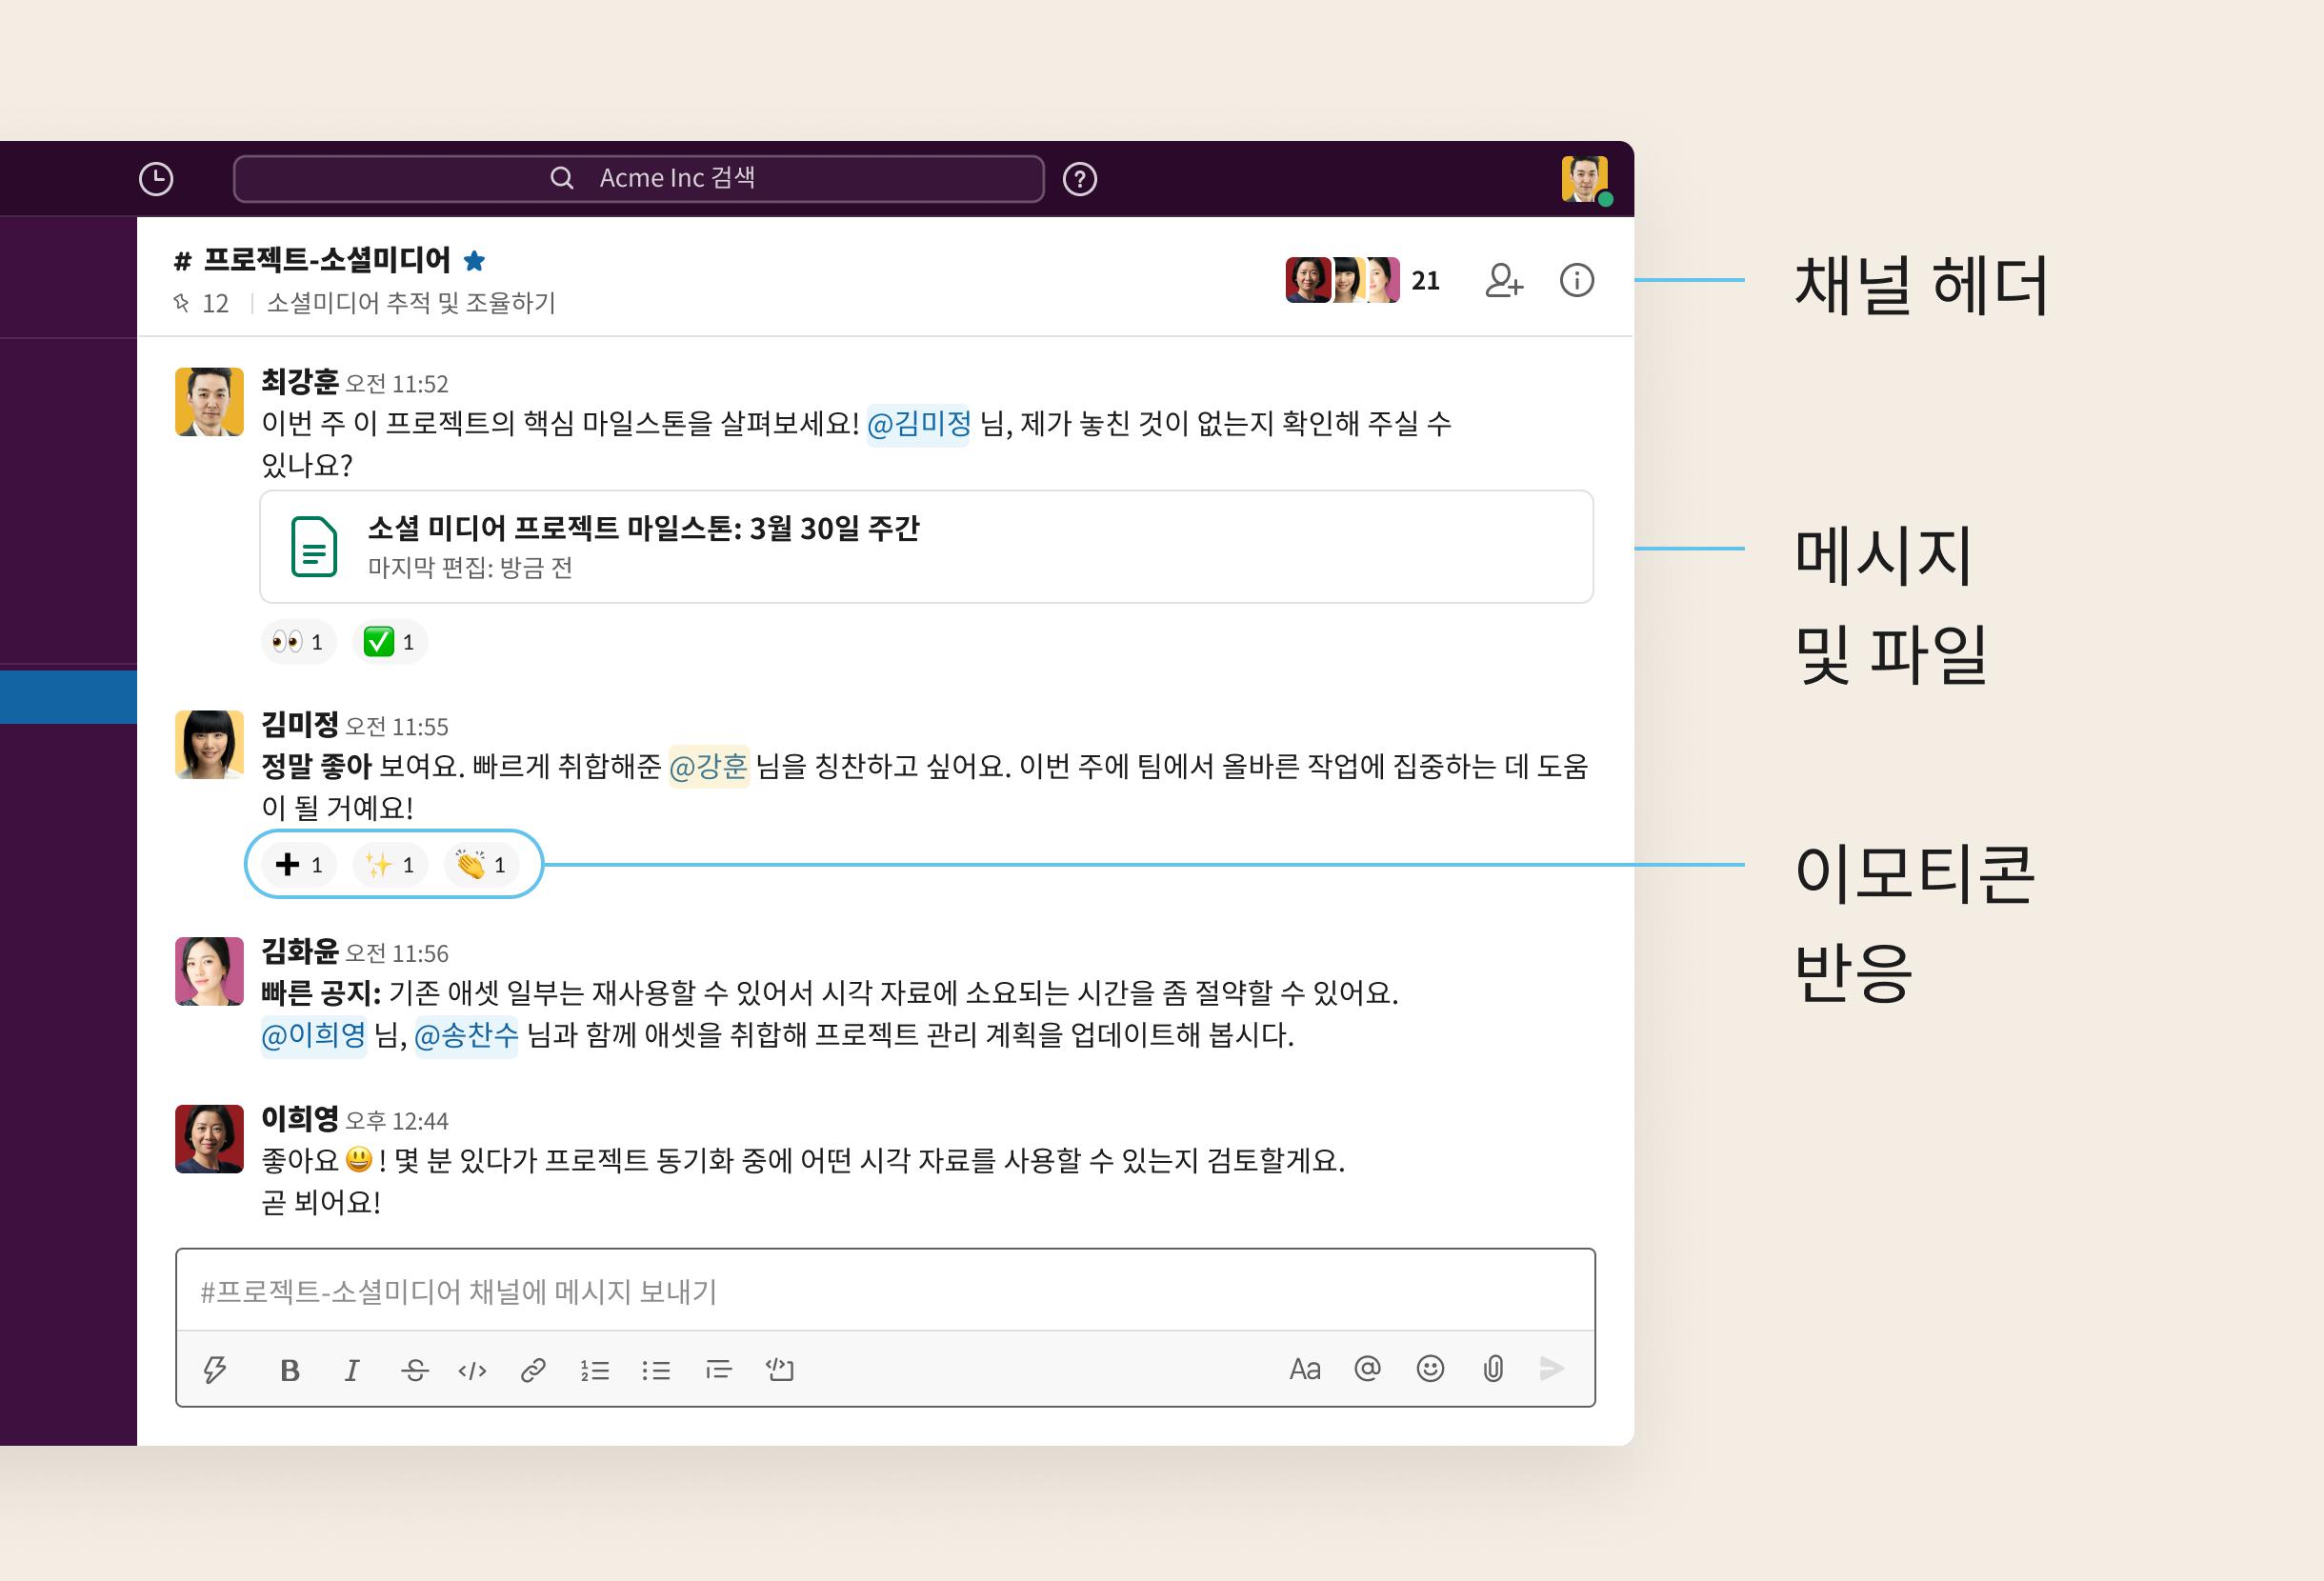 Slack 채널에서 나누는 대화